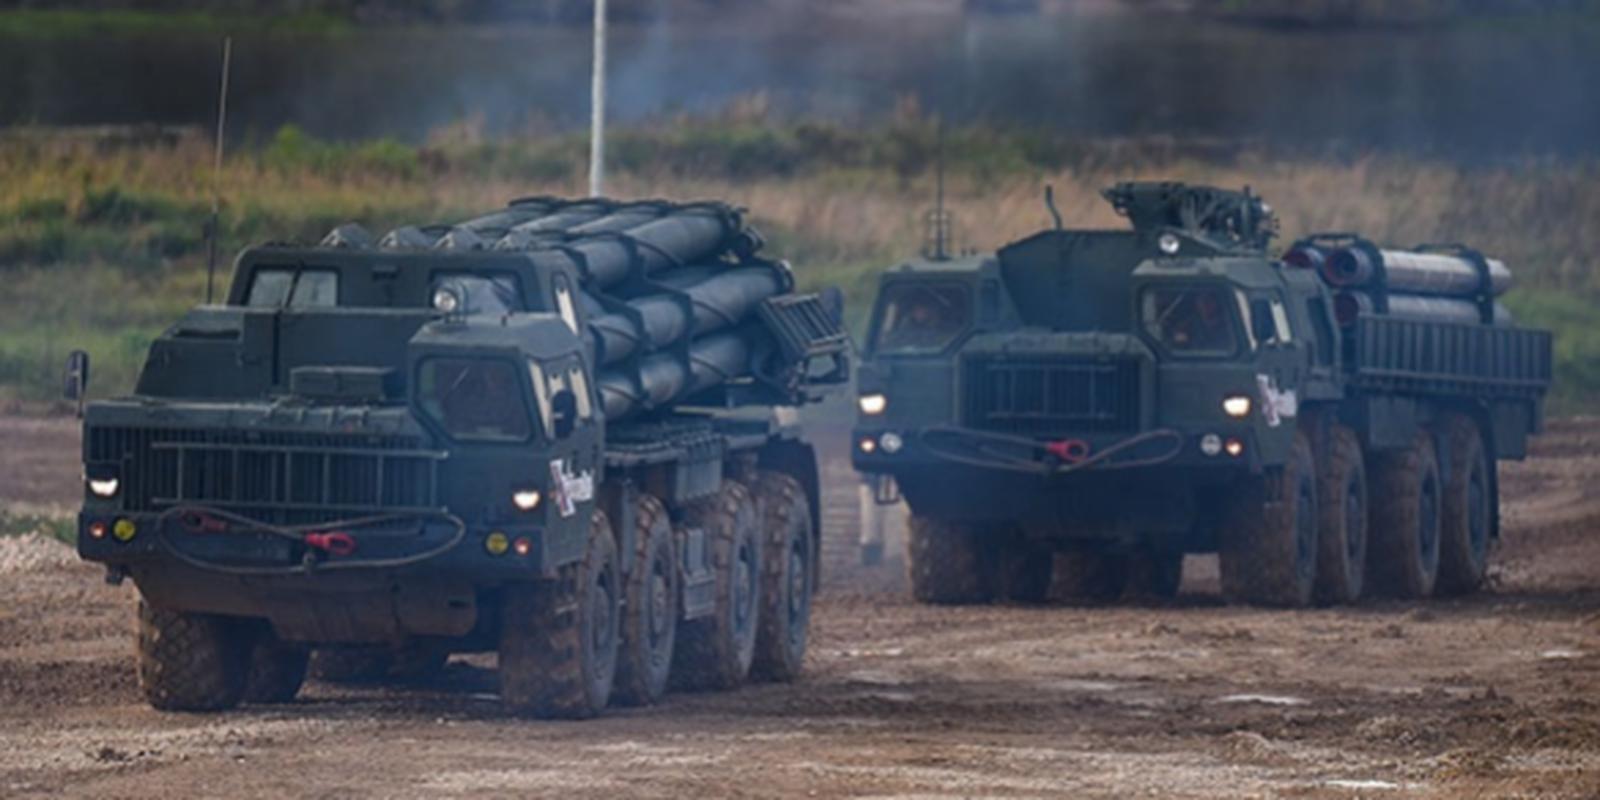 Ukraine muon mua UAV Tho Nhi Ky, Moscow them quan toi bien gioi-Hinh-15